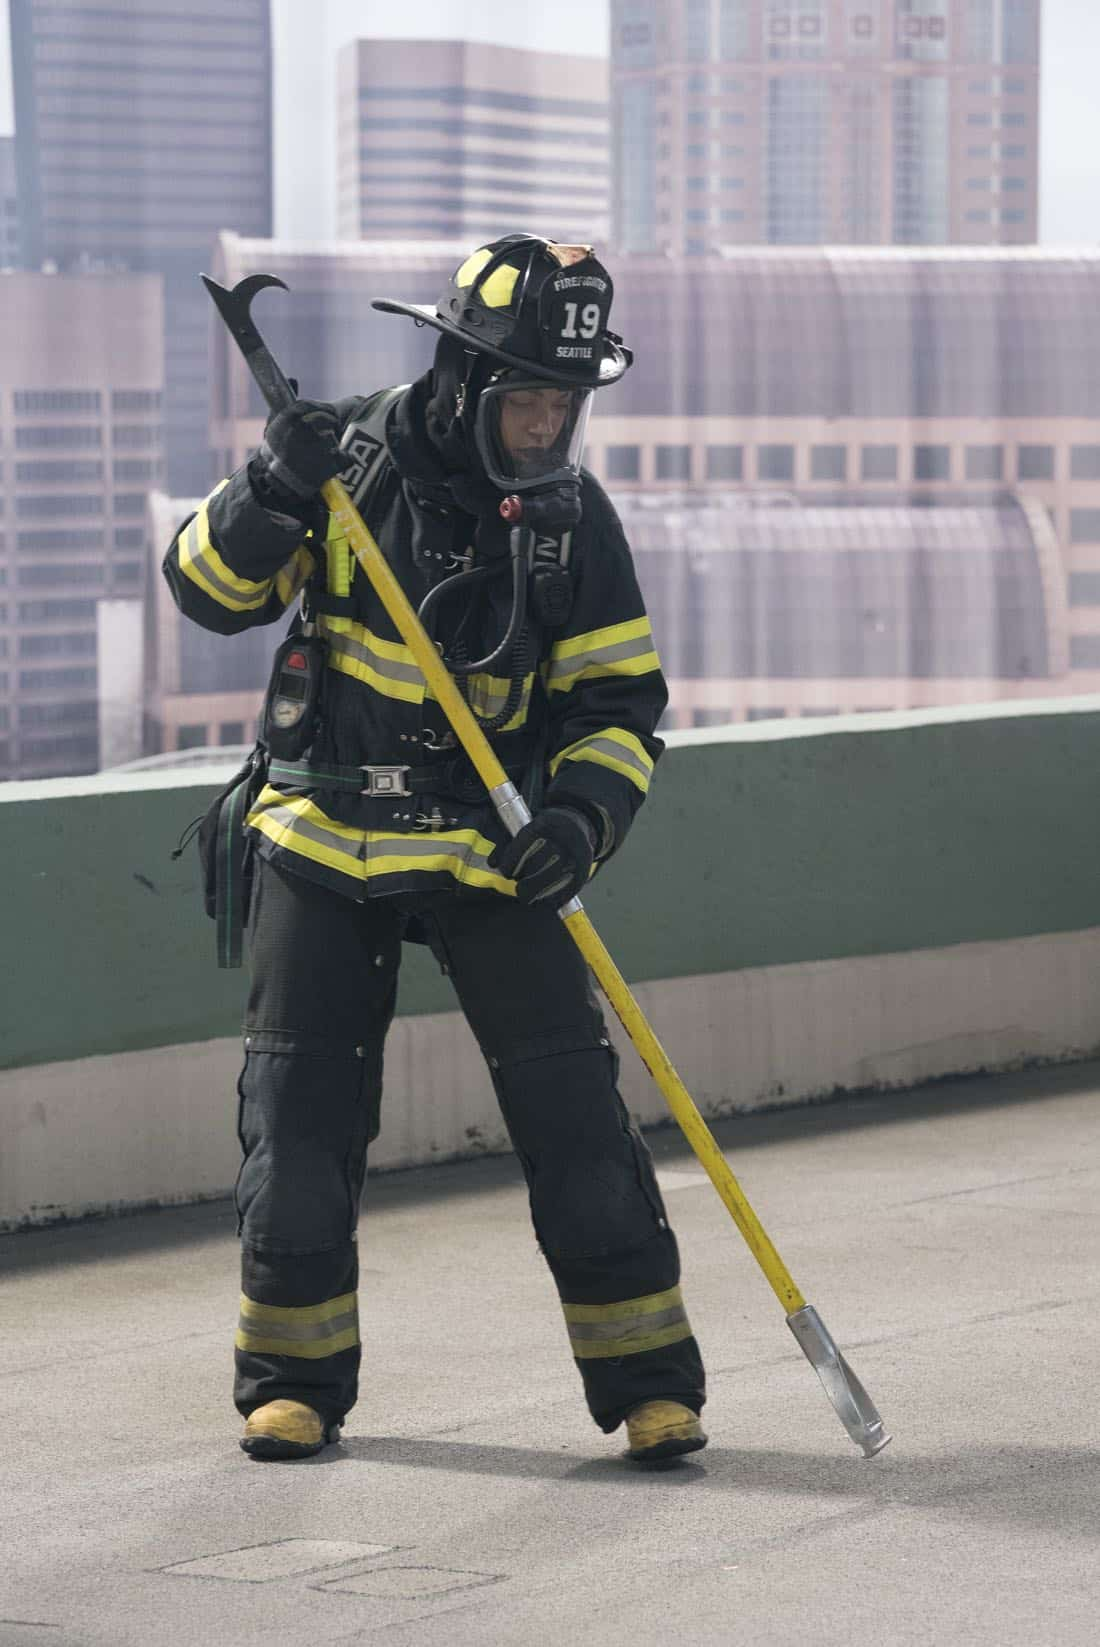 Station 19 Episode 3 Season 1 Contain The Flame 03